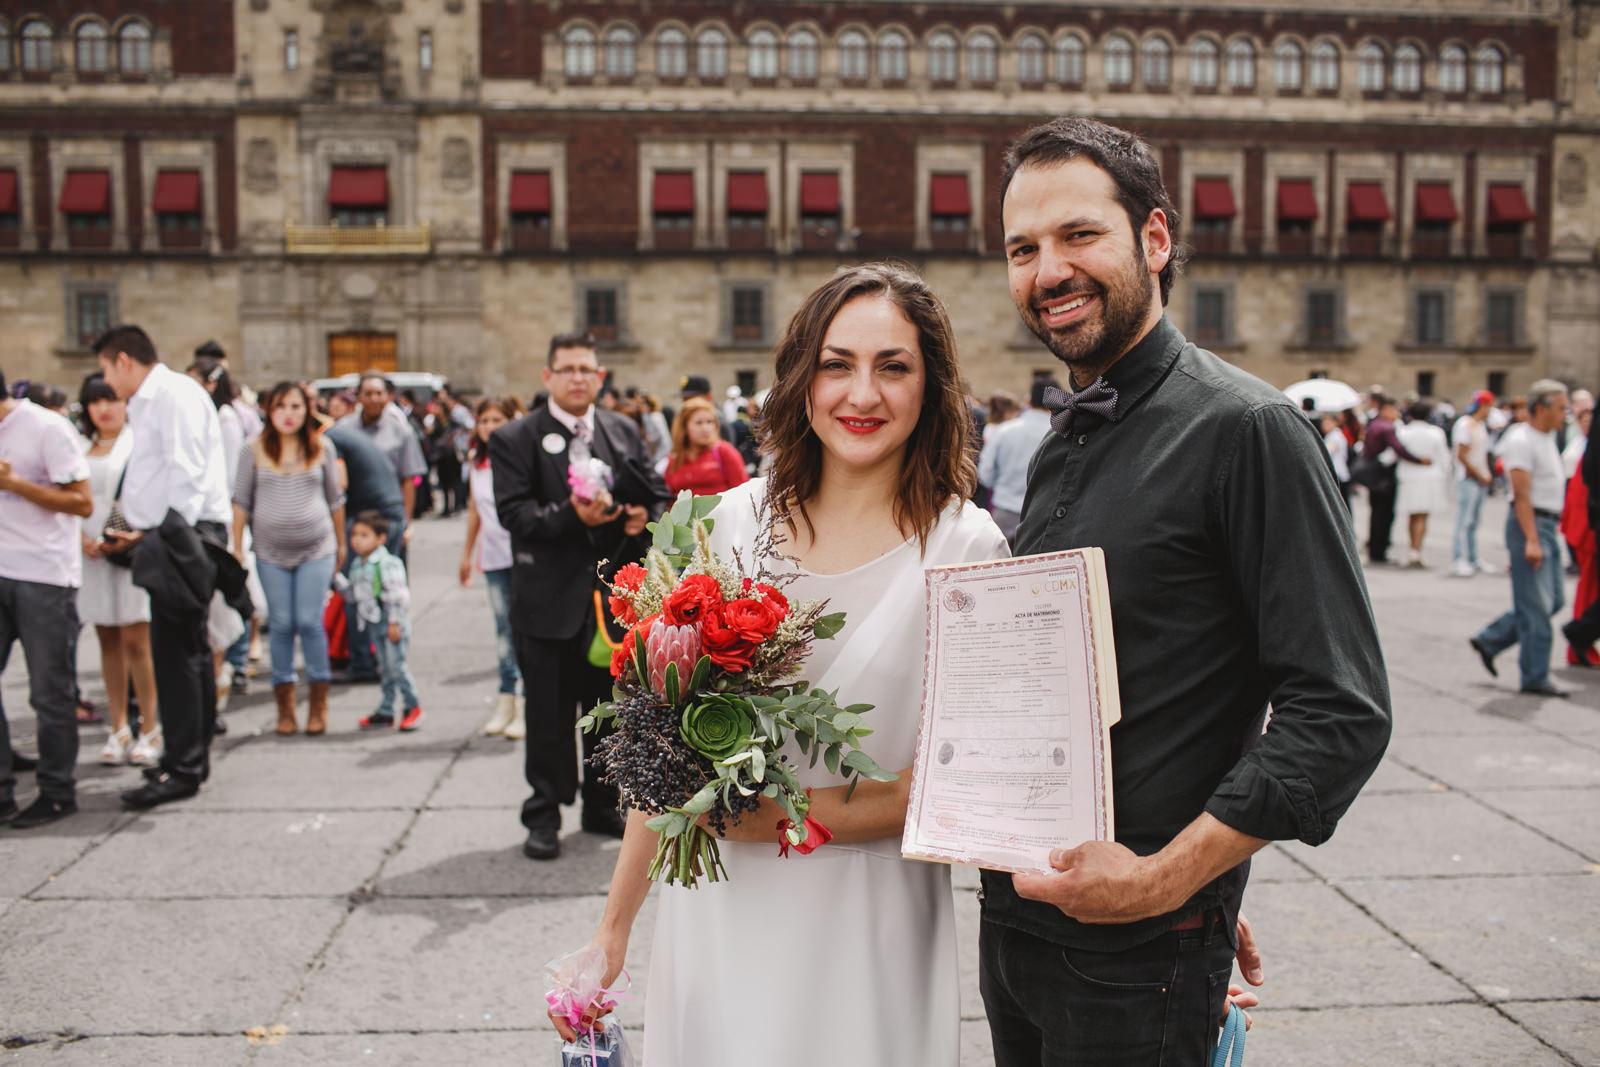 boda-en-cdmx-armando-aragon-038